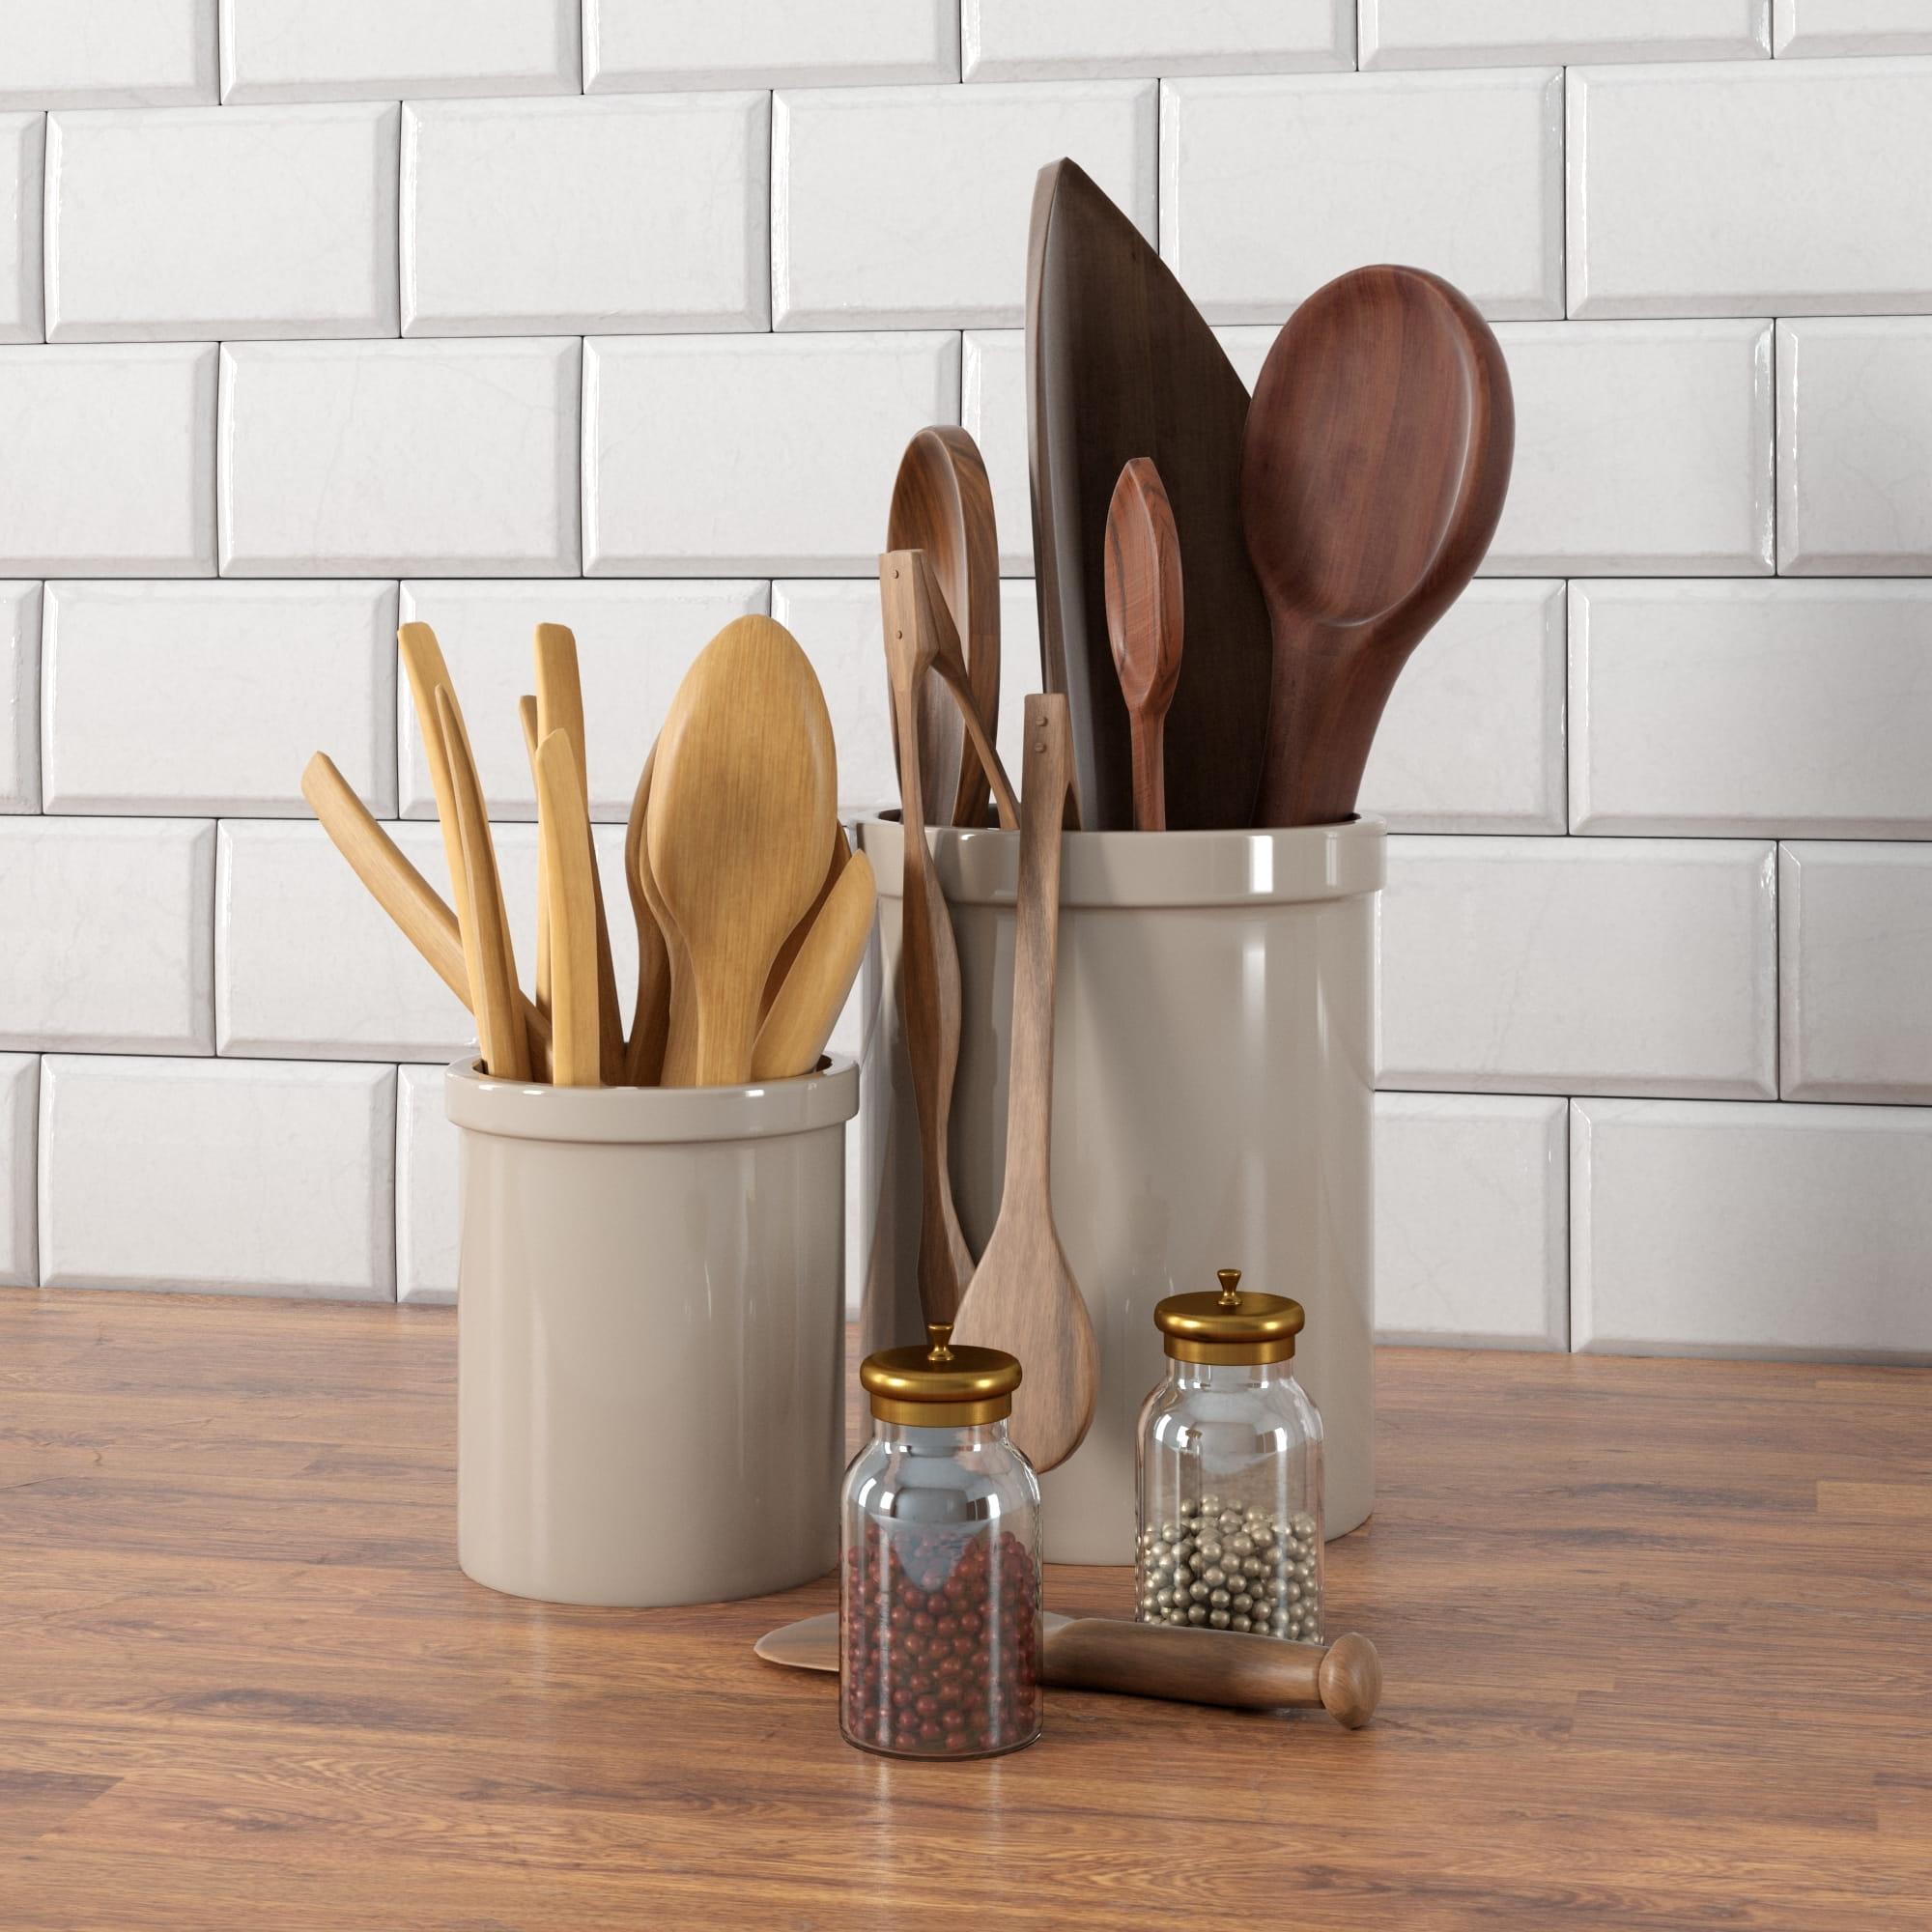 kitchen props 17 AM231 Archmodels